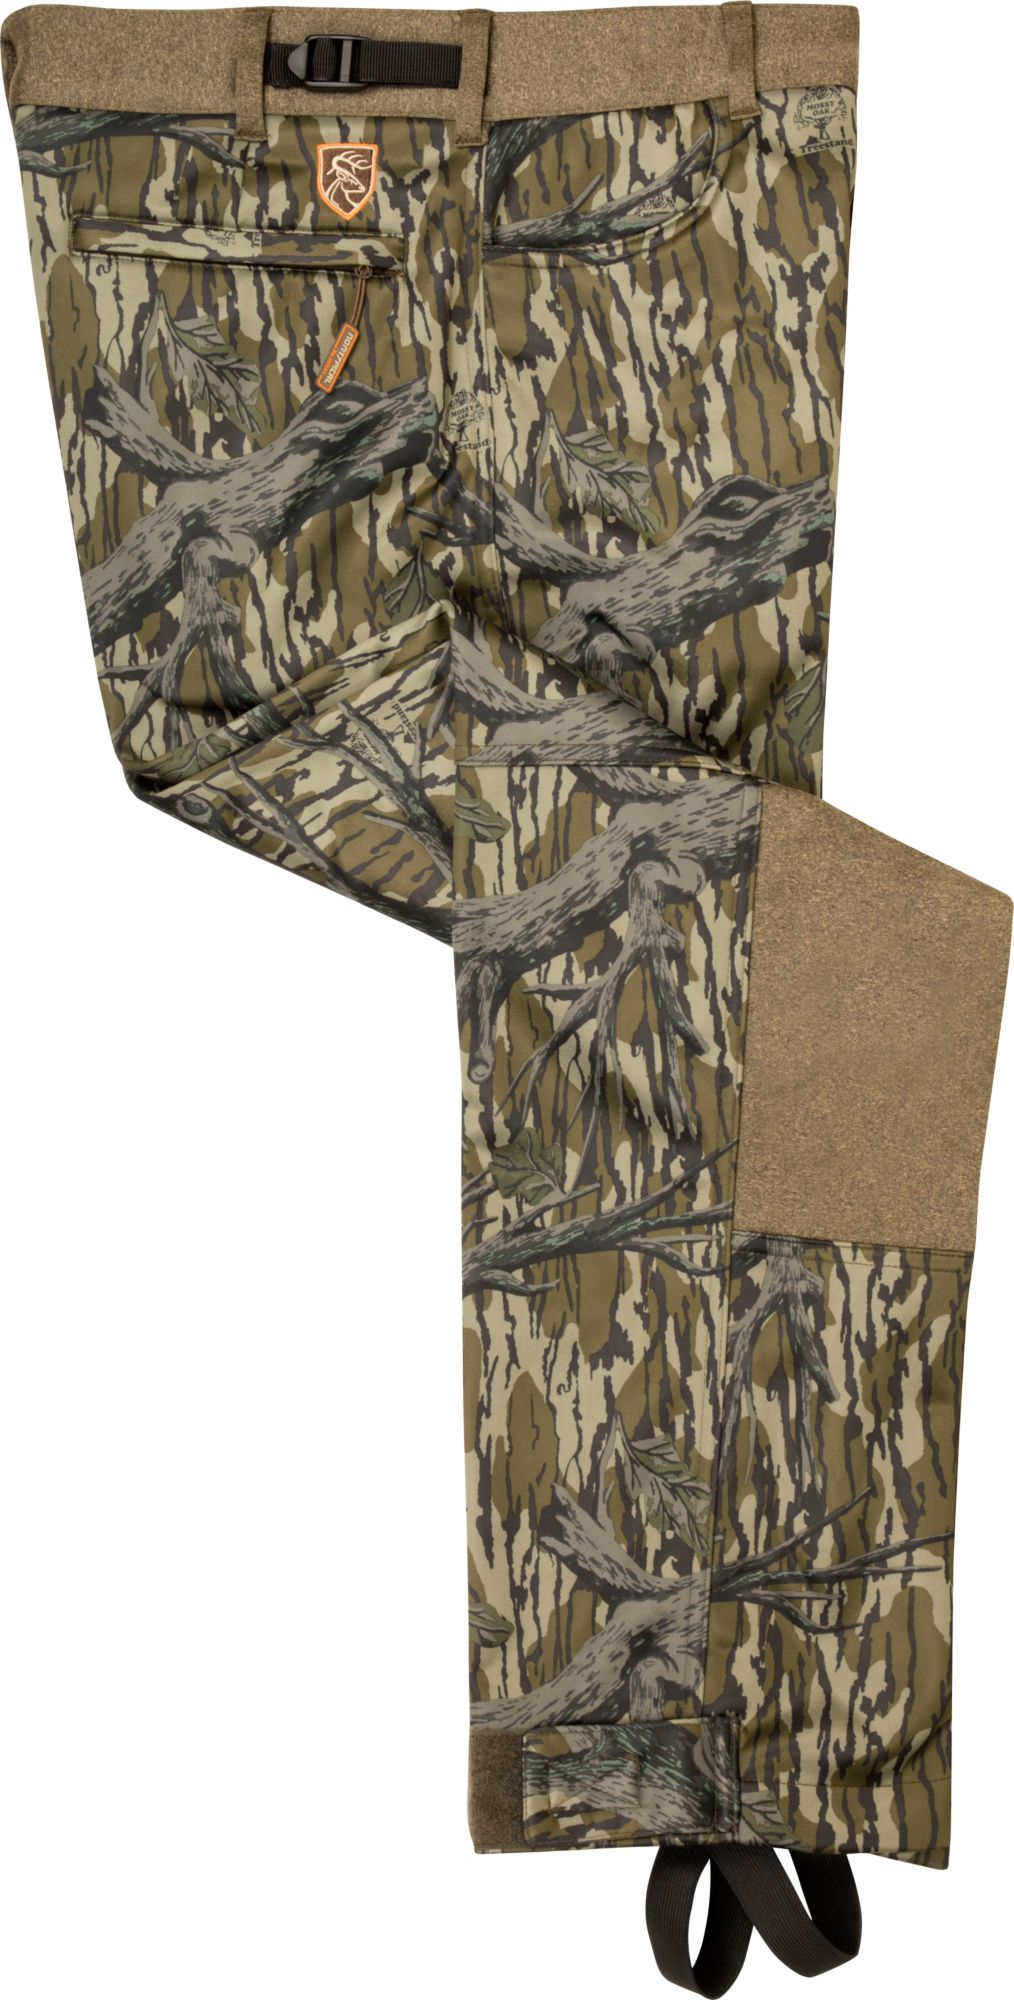 Drake Waterfowl Men's Endurance Jean Cut Hunting Pants, Size: Medium, Mossy Oak Orig Treestand thumbnail